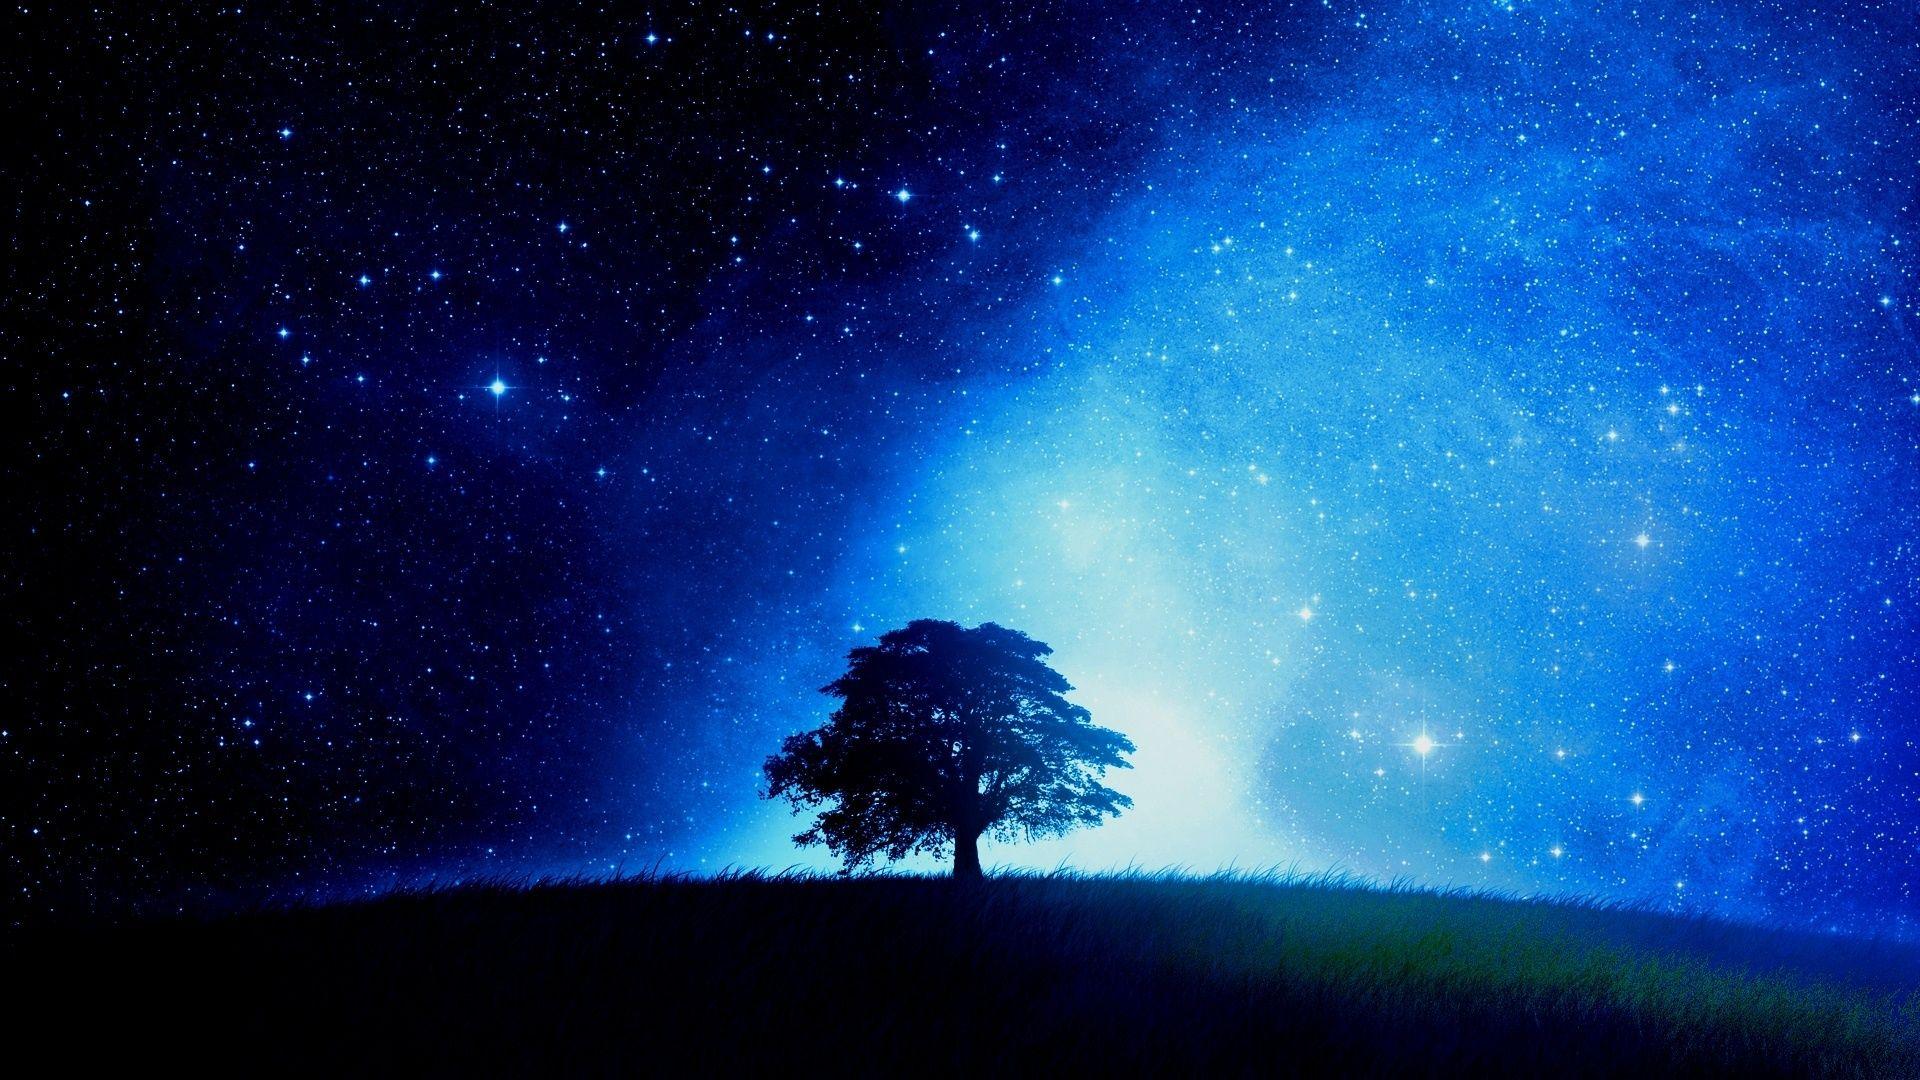 Night Stars Wallpaper Hd Backgrounds